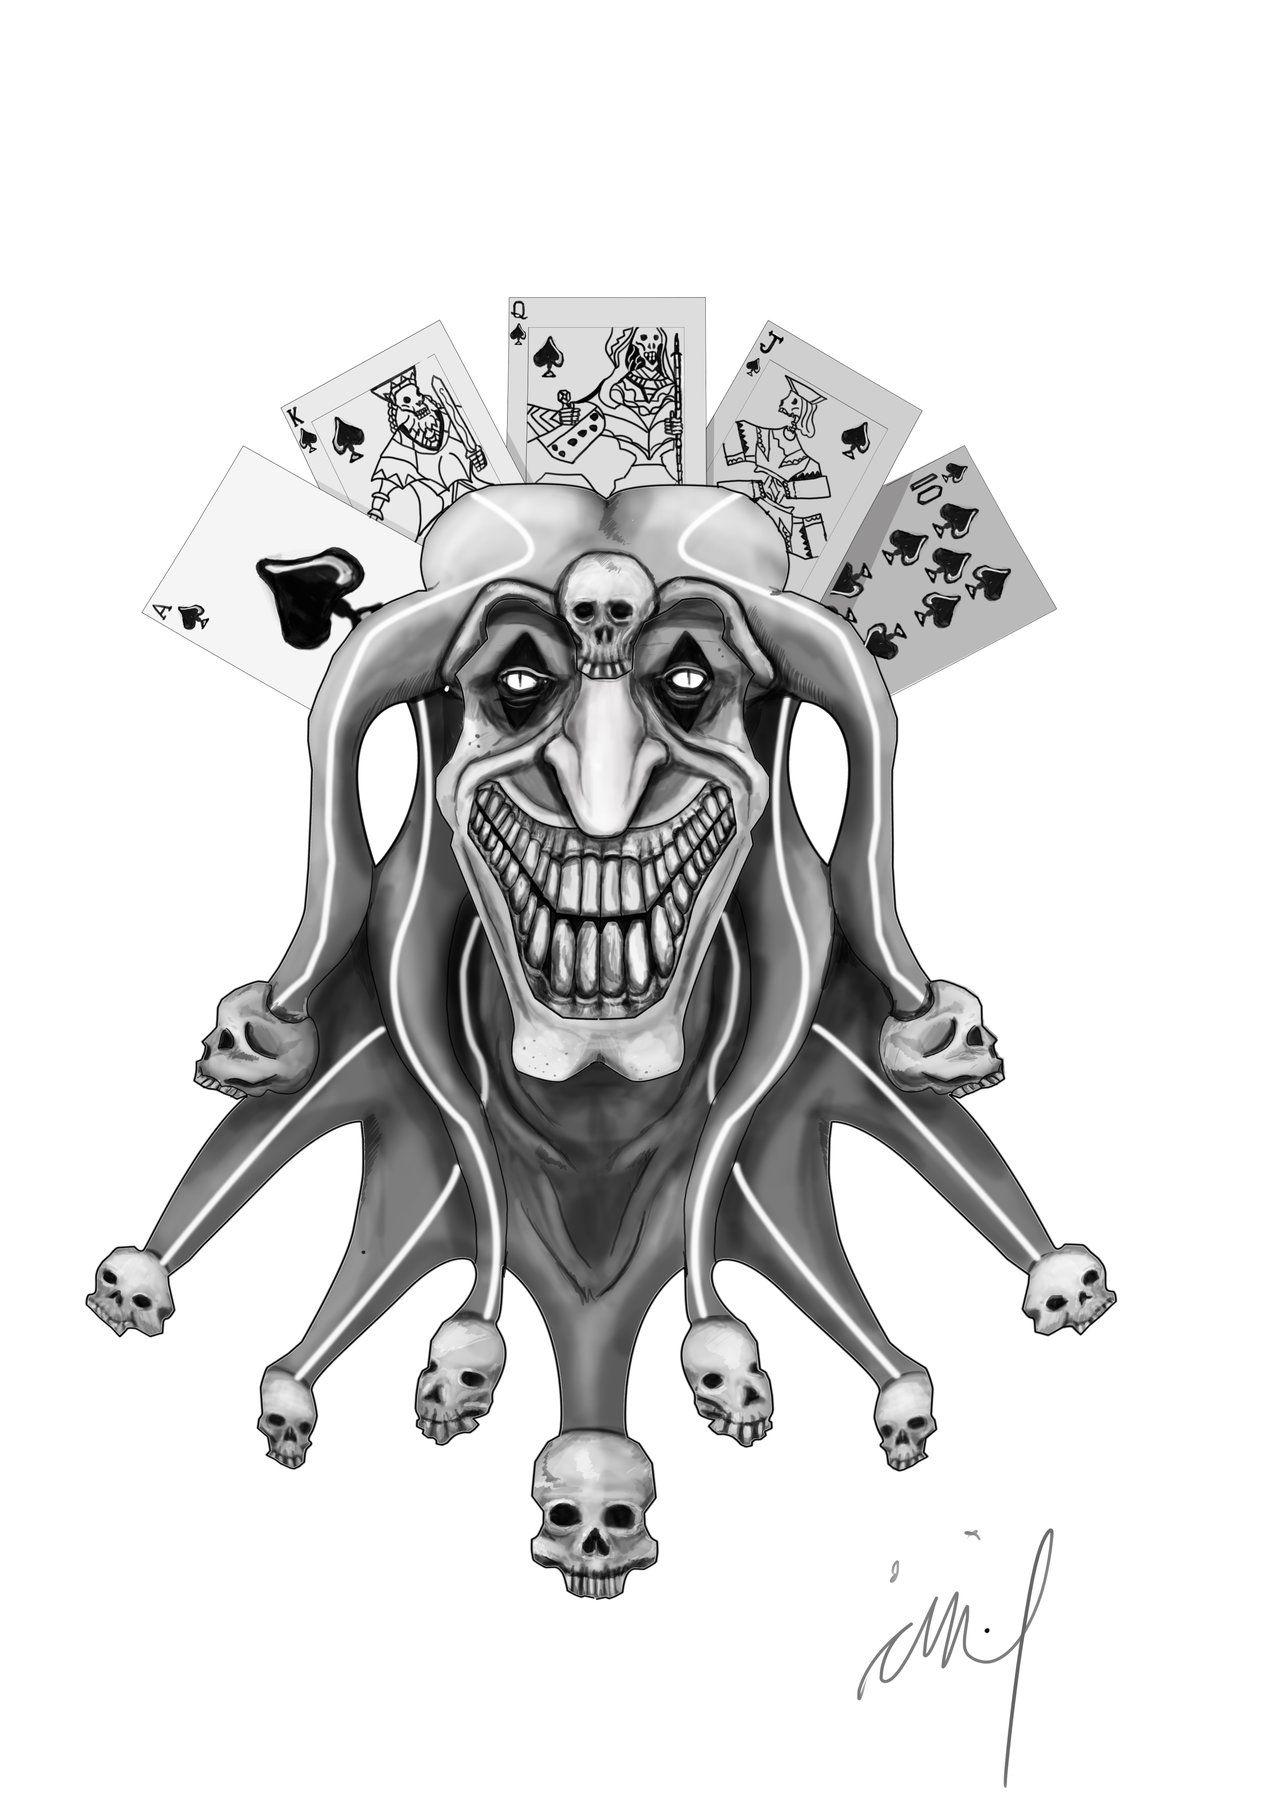 Joker Tattoo Design By Langkjaer.deviantart.com On @DeviantArt ...